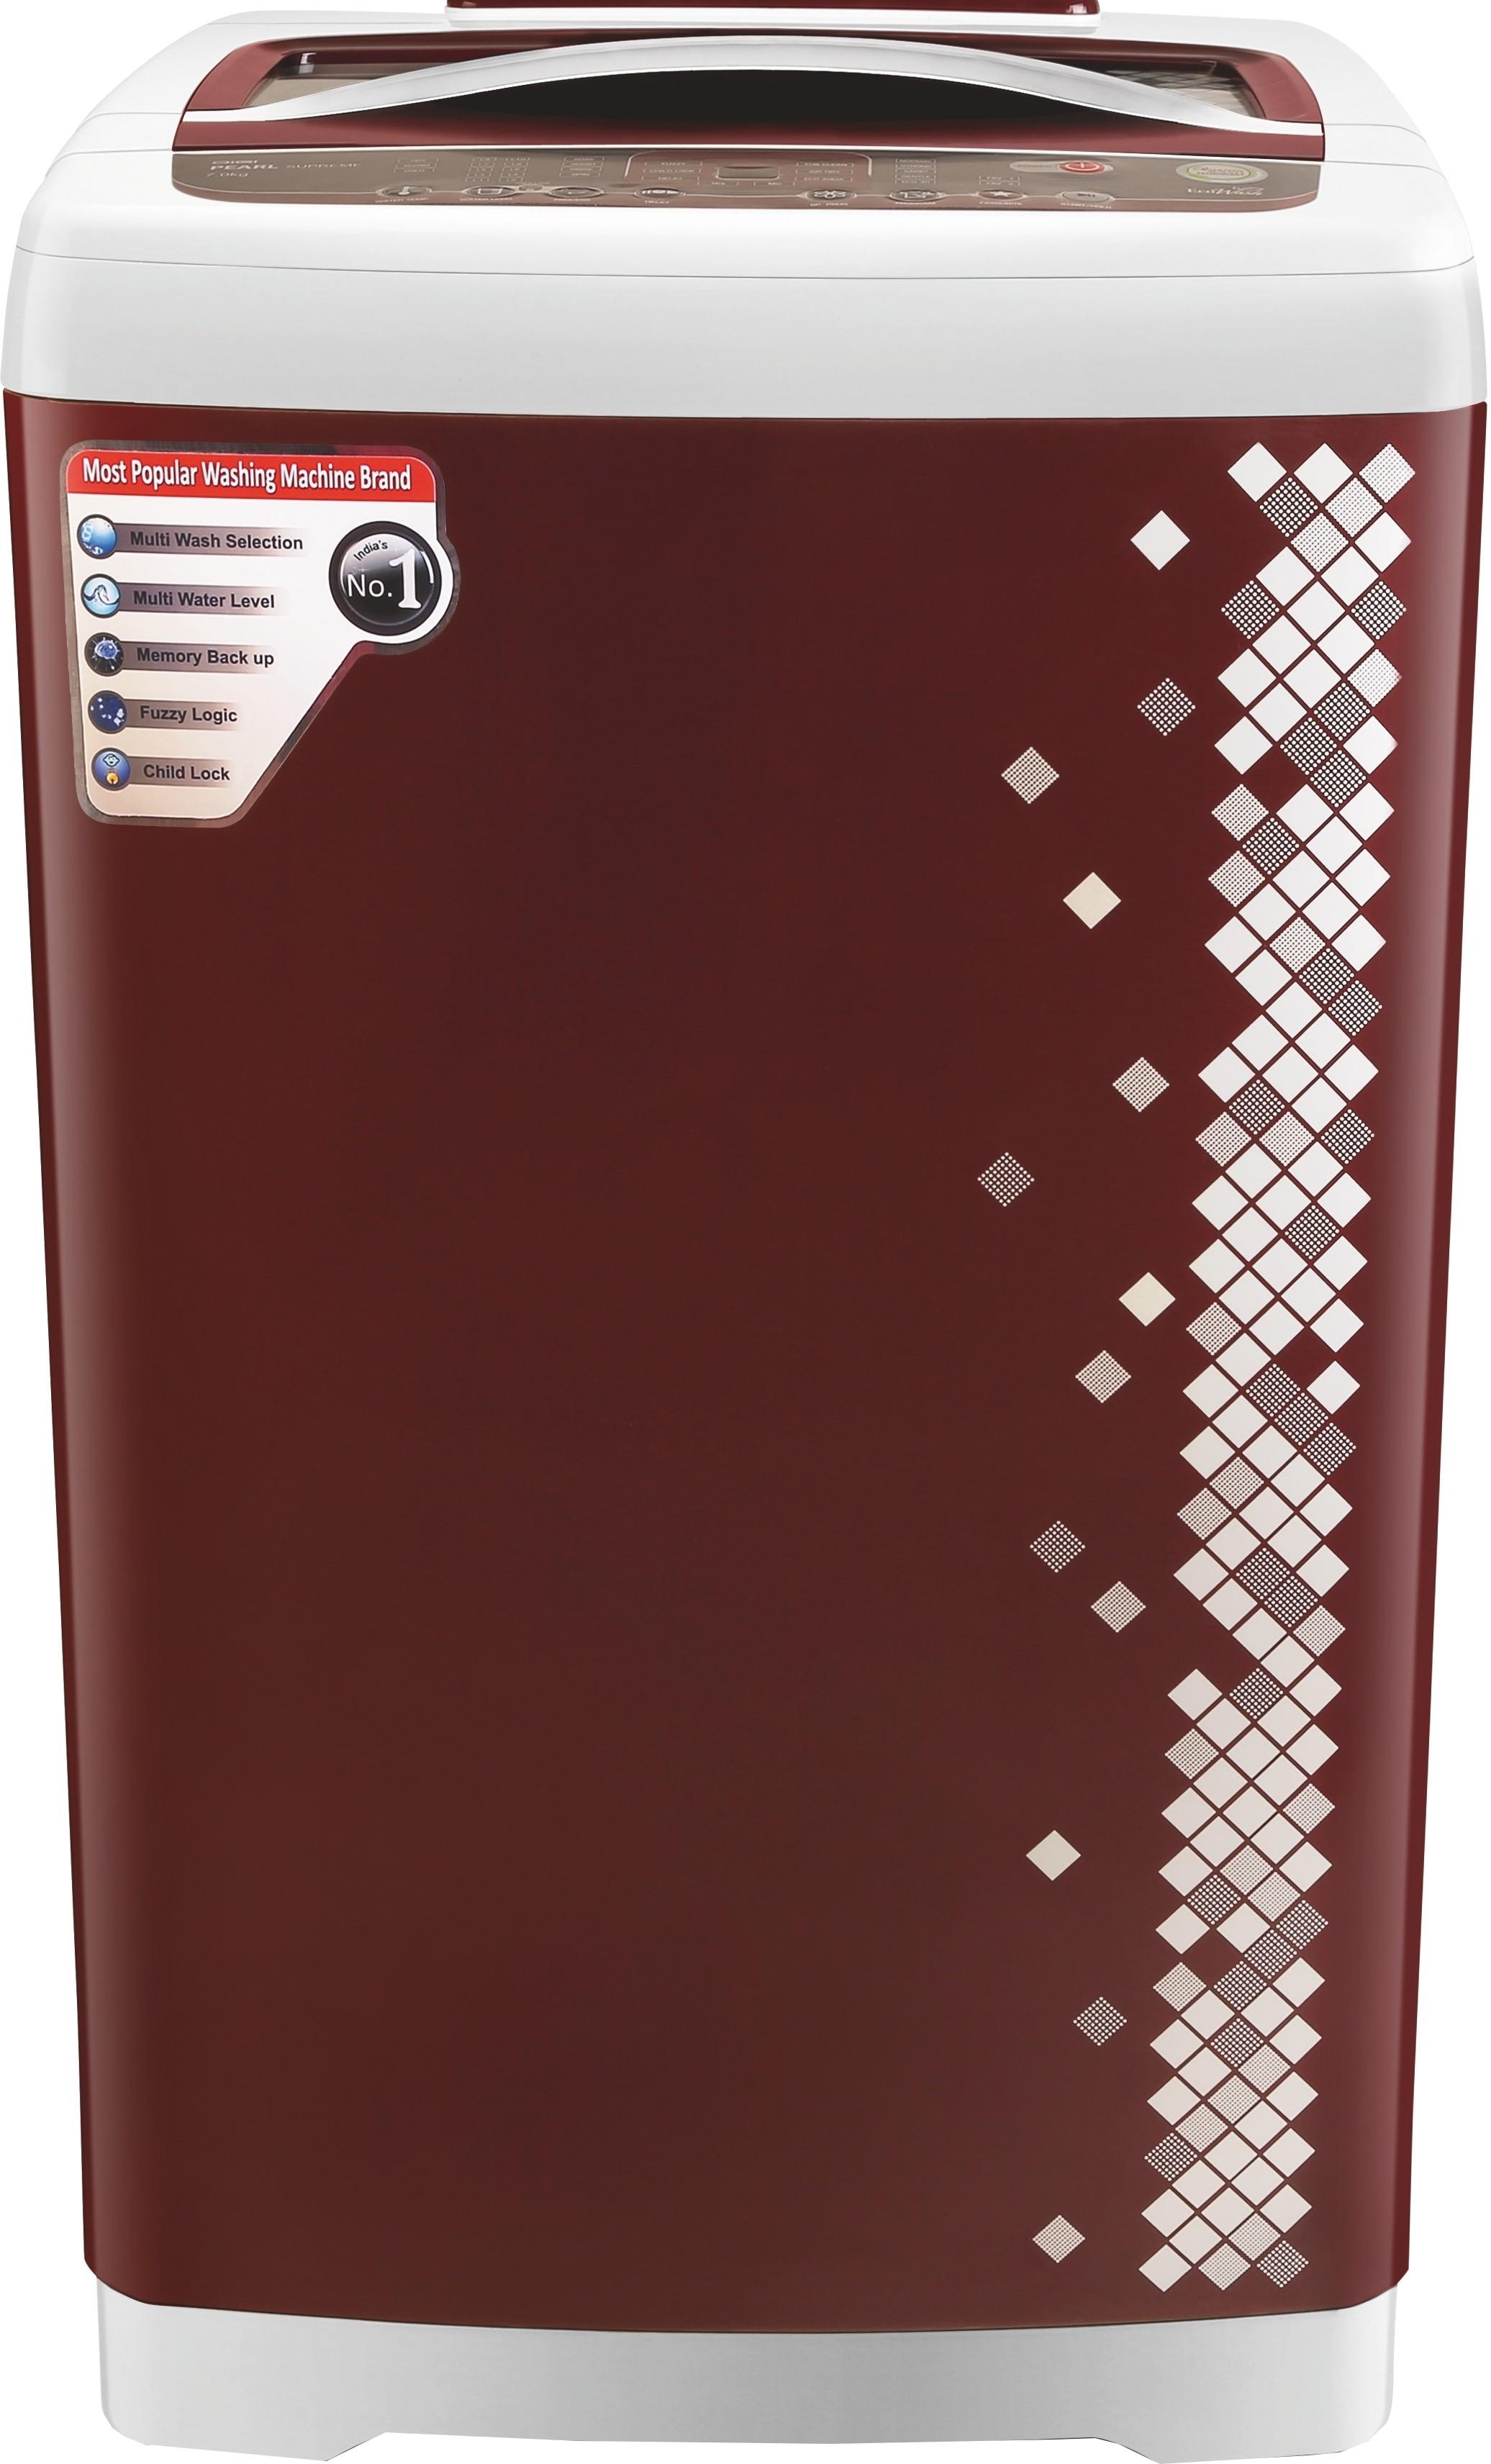 VIDEOCON VT70G12 DIGI PEARL 7KG Fully Automatic Top Load Washing Machine